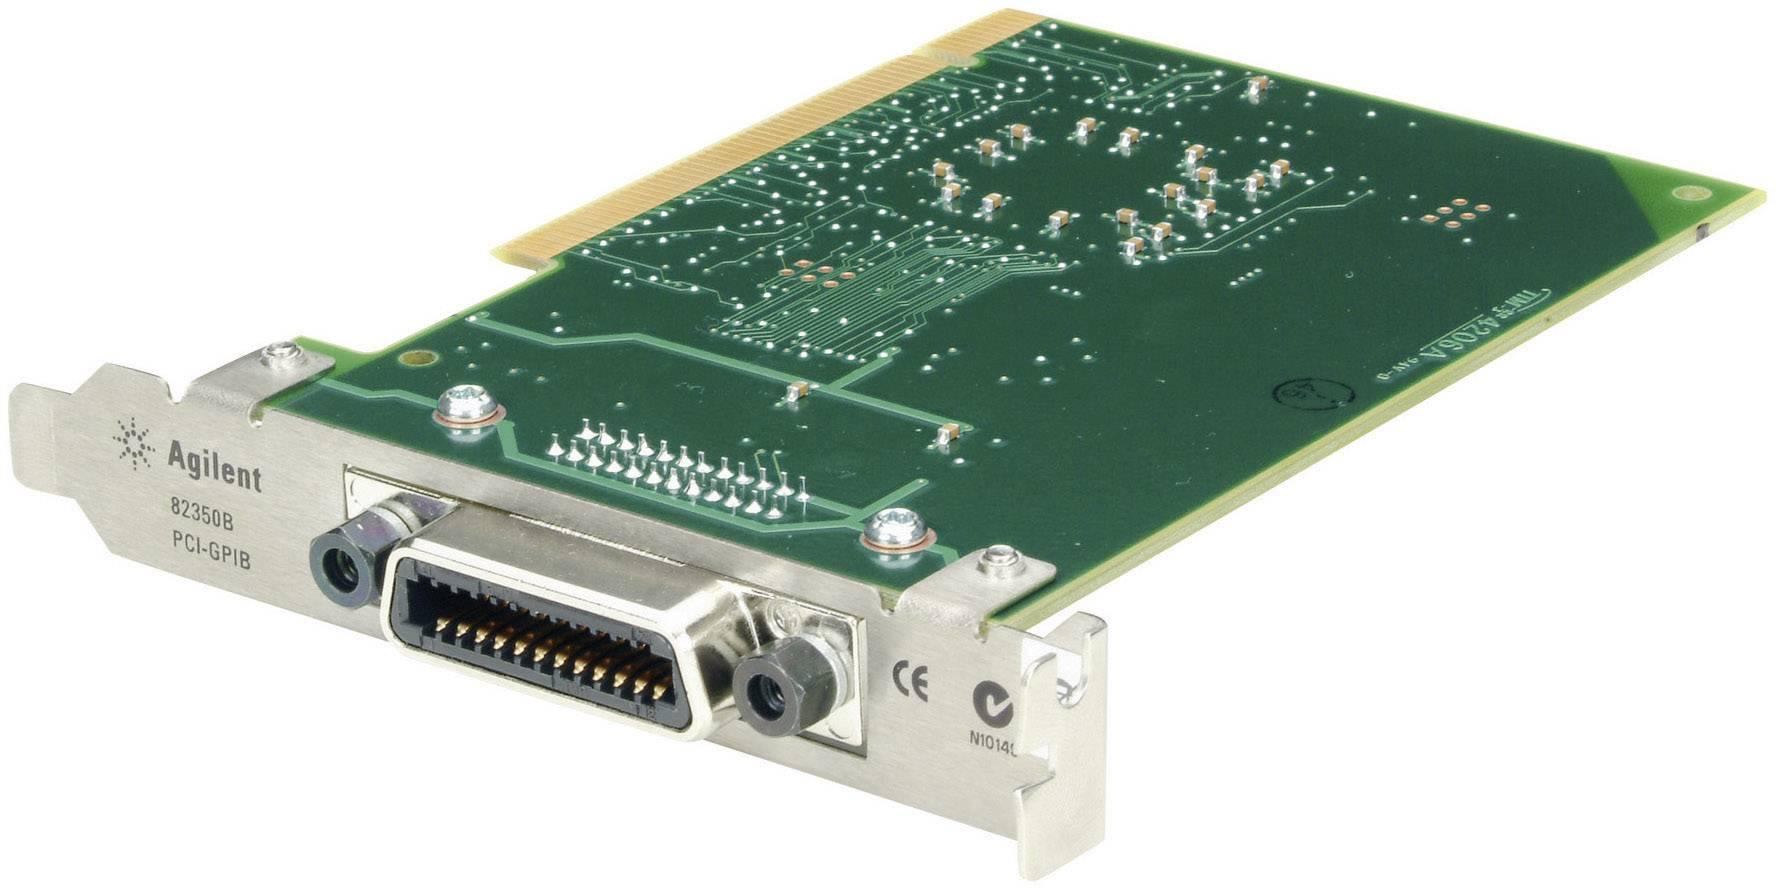 The Hewlett-Packard Interface Bus (HP-IB)